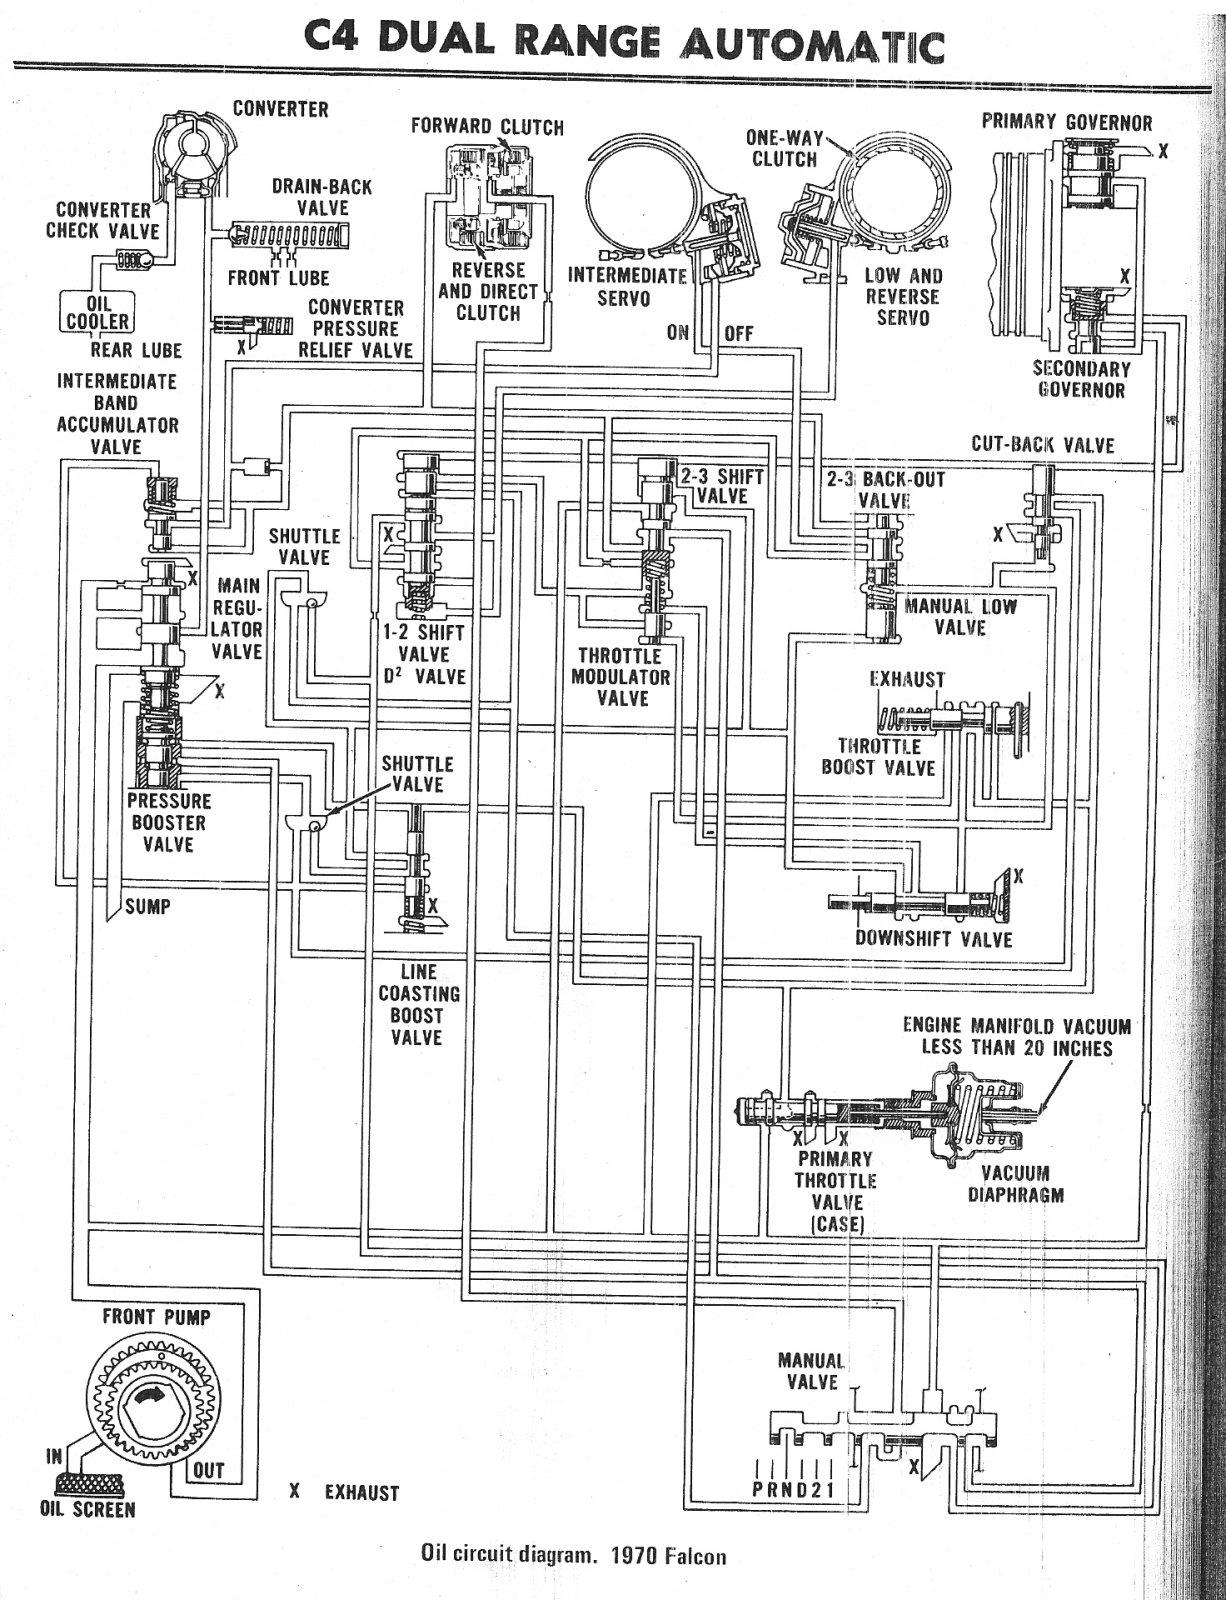 hight resolution of c4 question vintage mustang forums 1970 ford c4 transmission diagram c4 transmission diagram